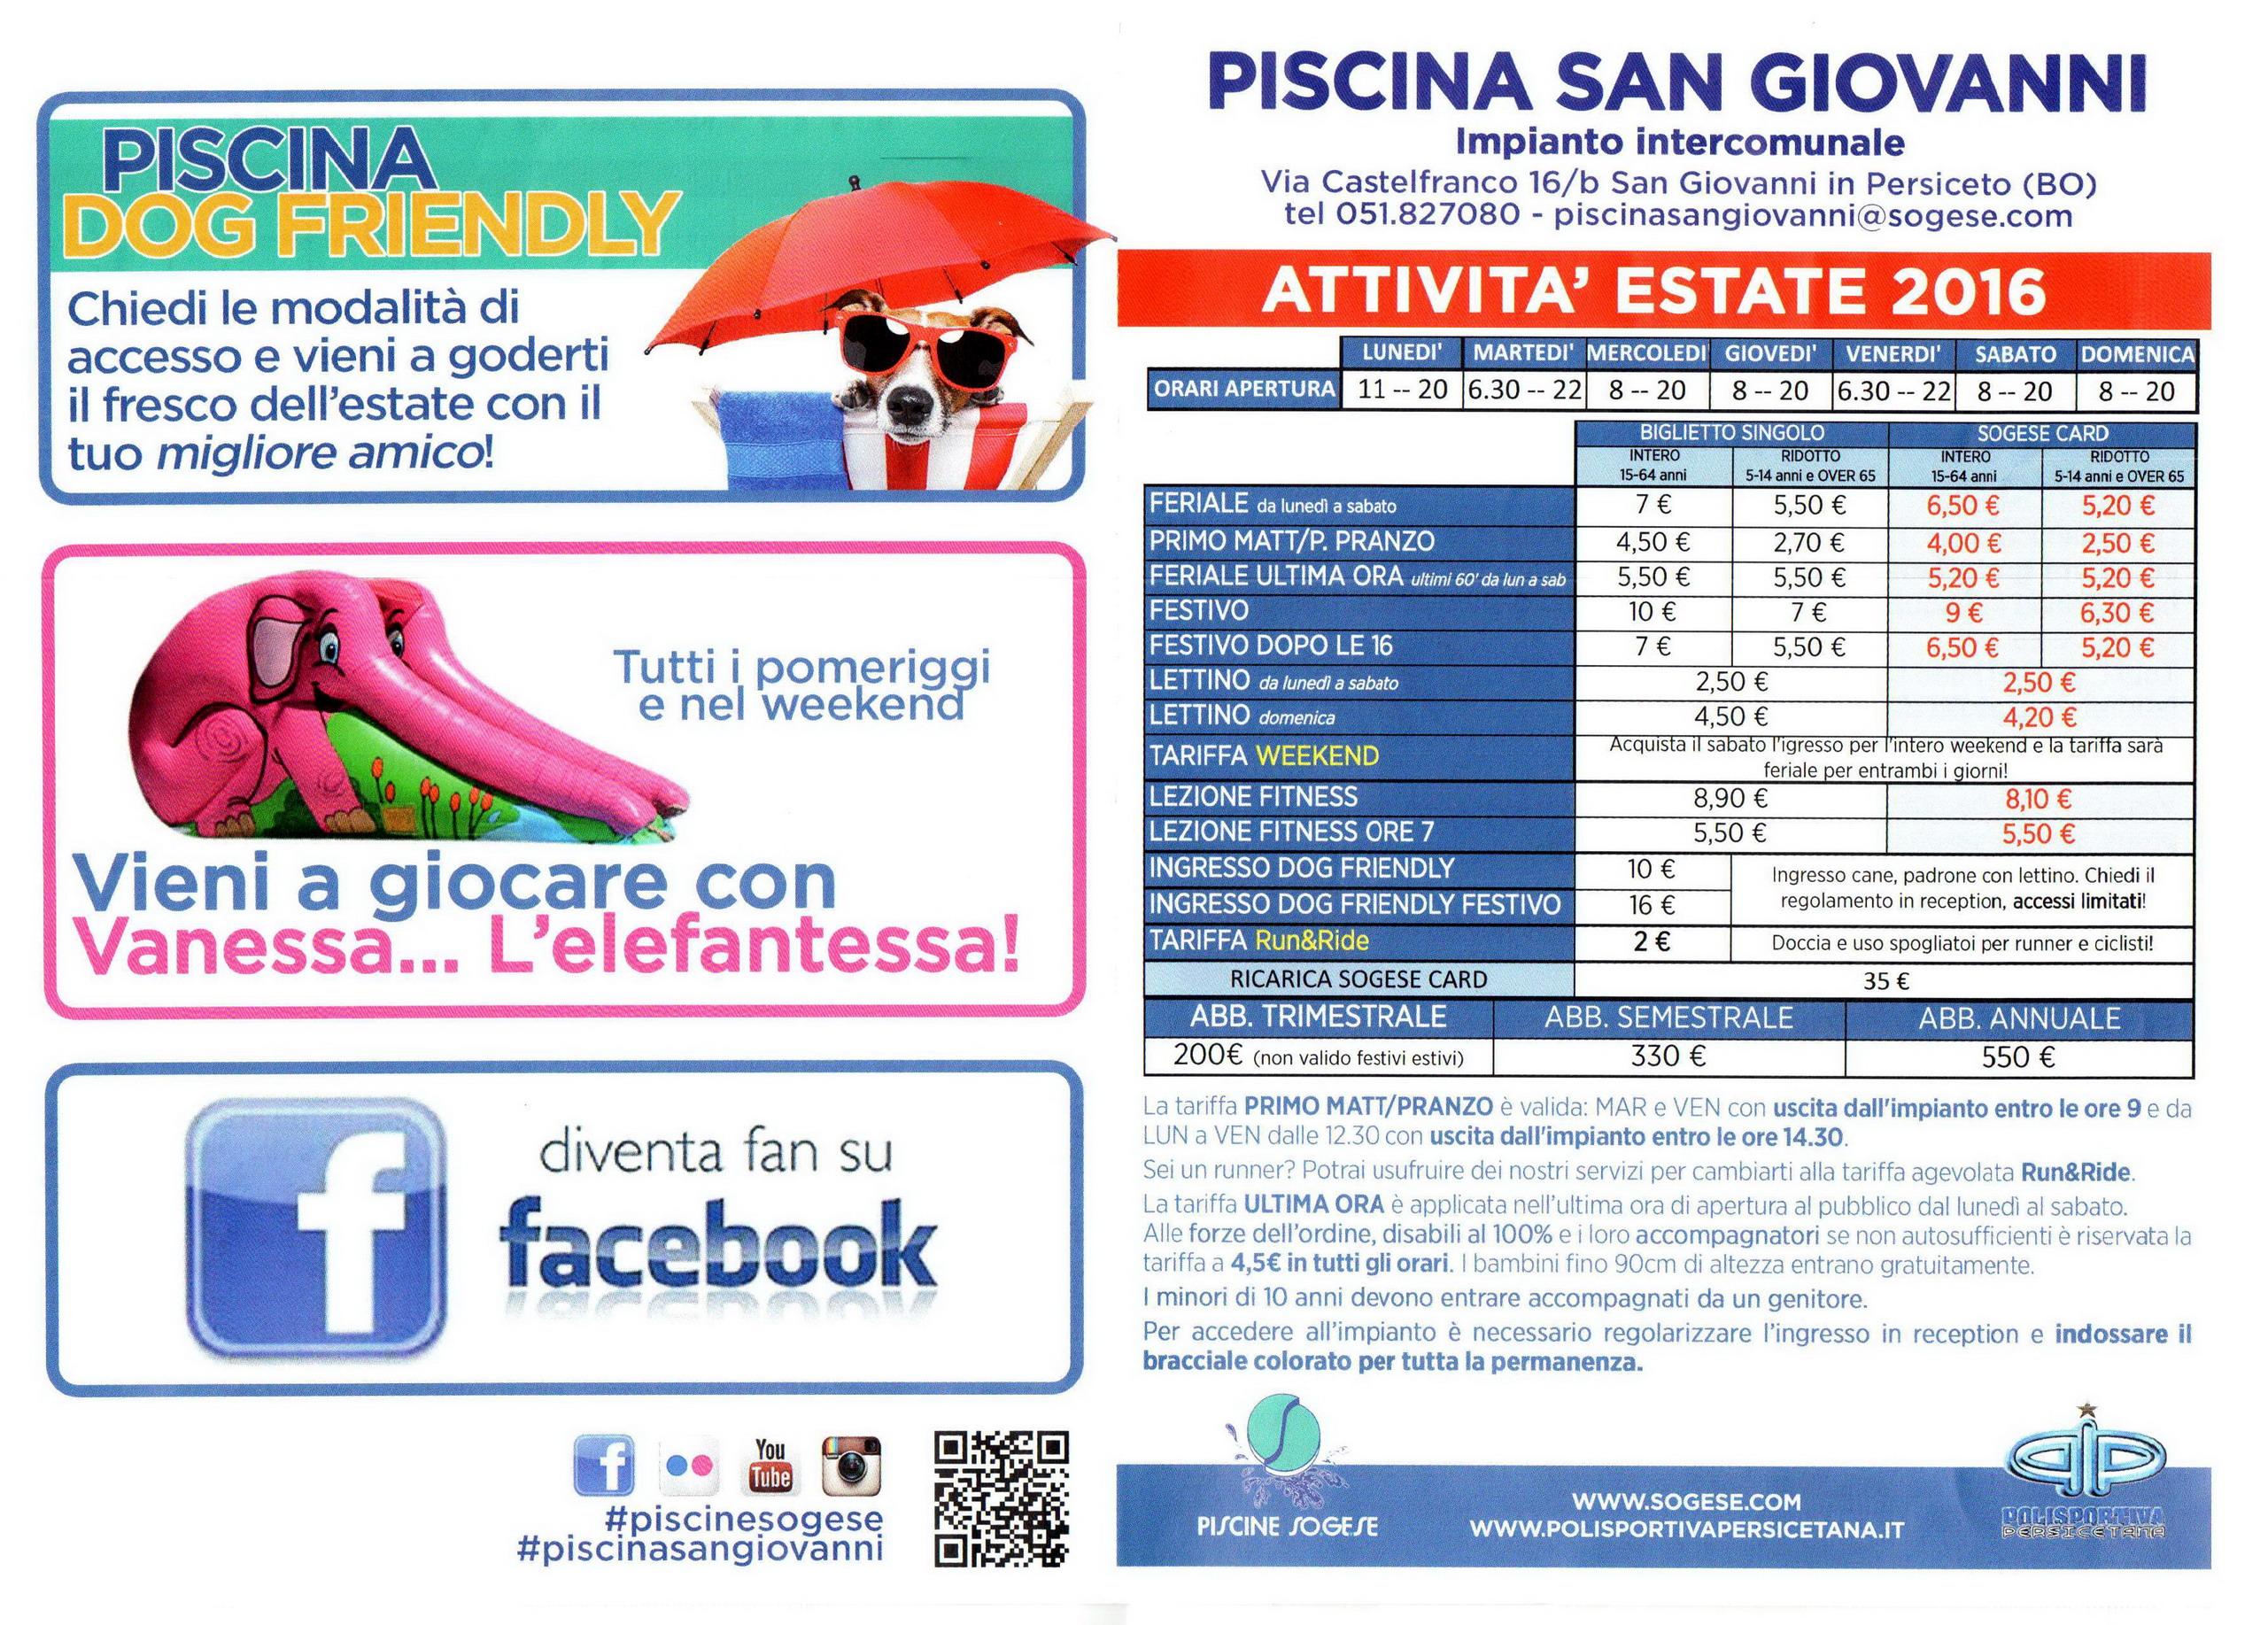 Piscina San Giovanni In Persiceto.Idropolis Piscine S R L